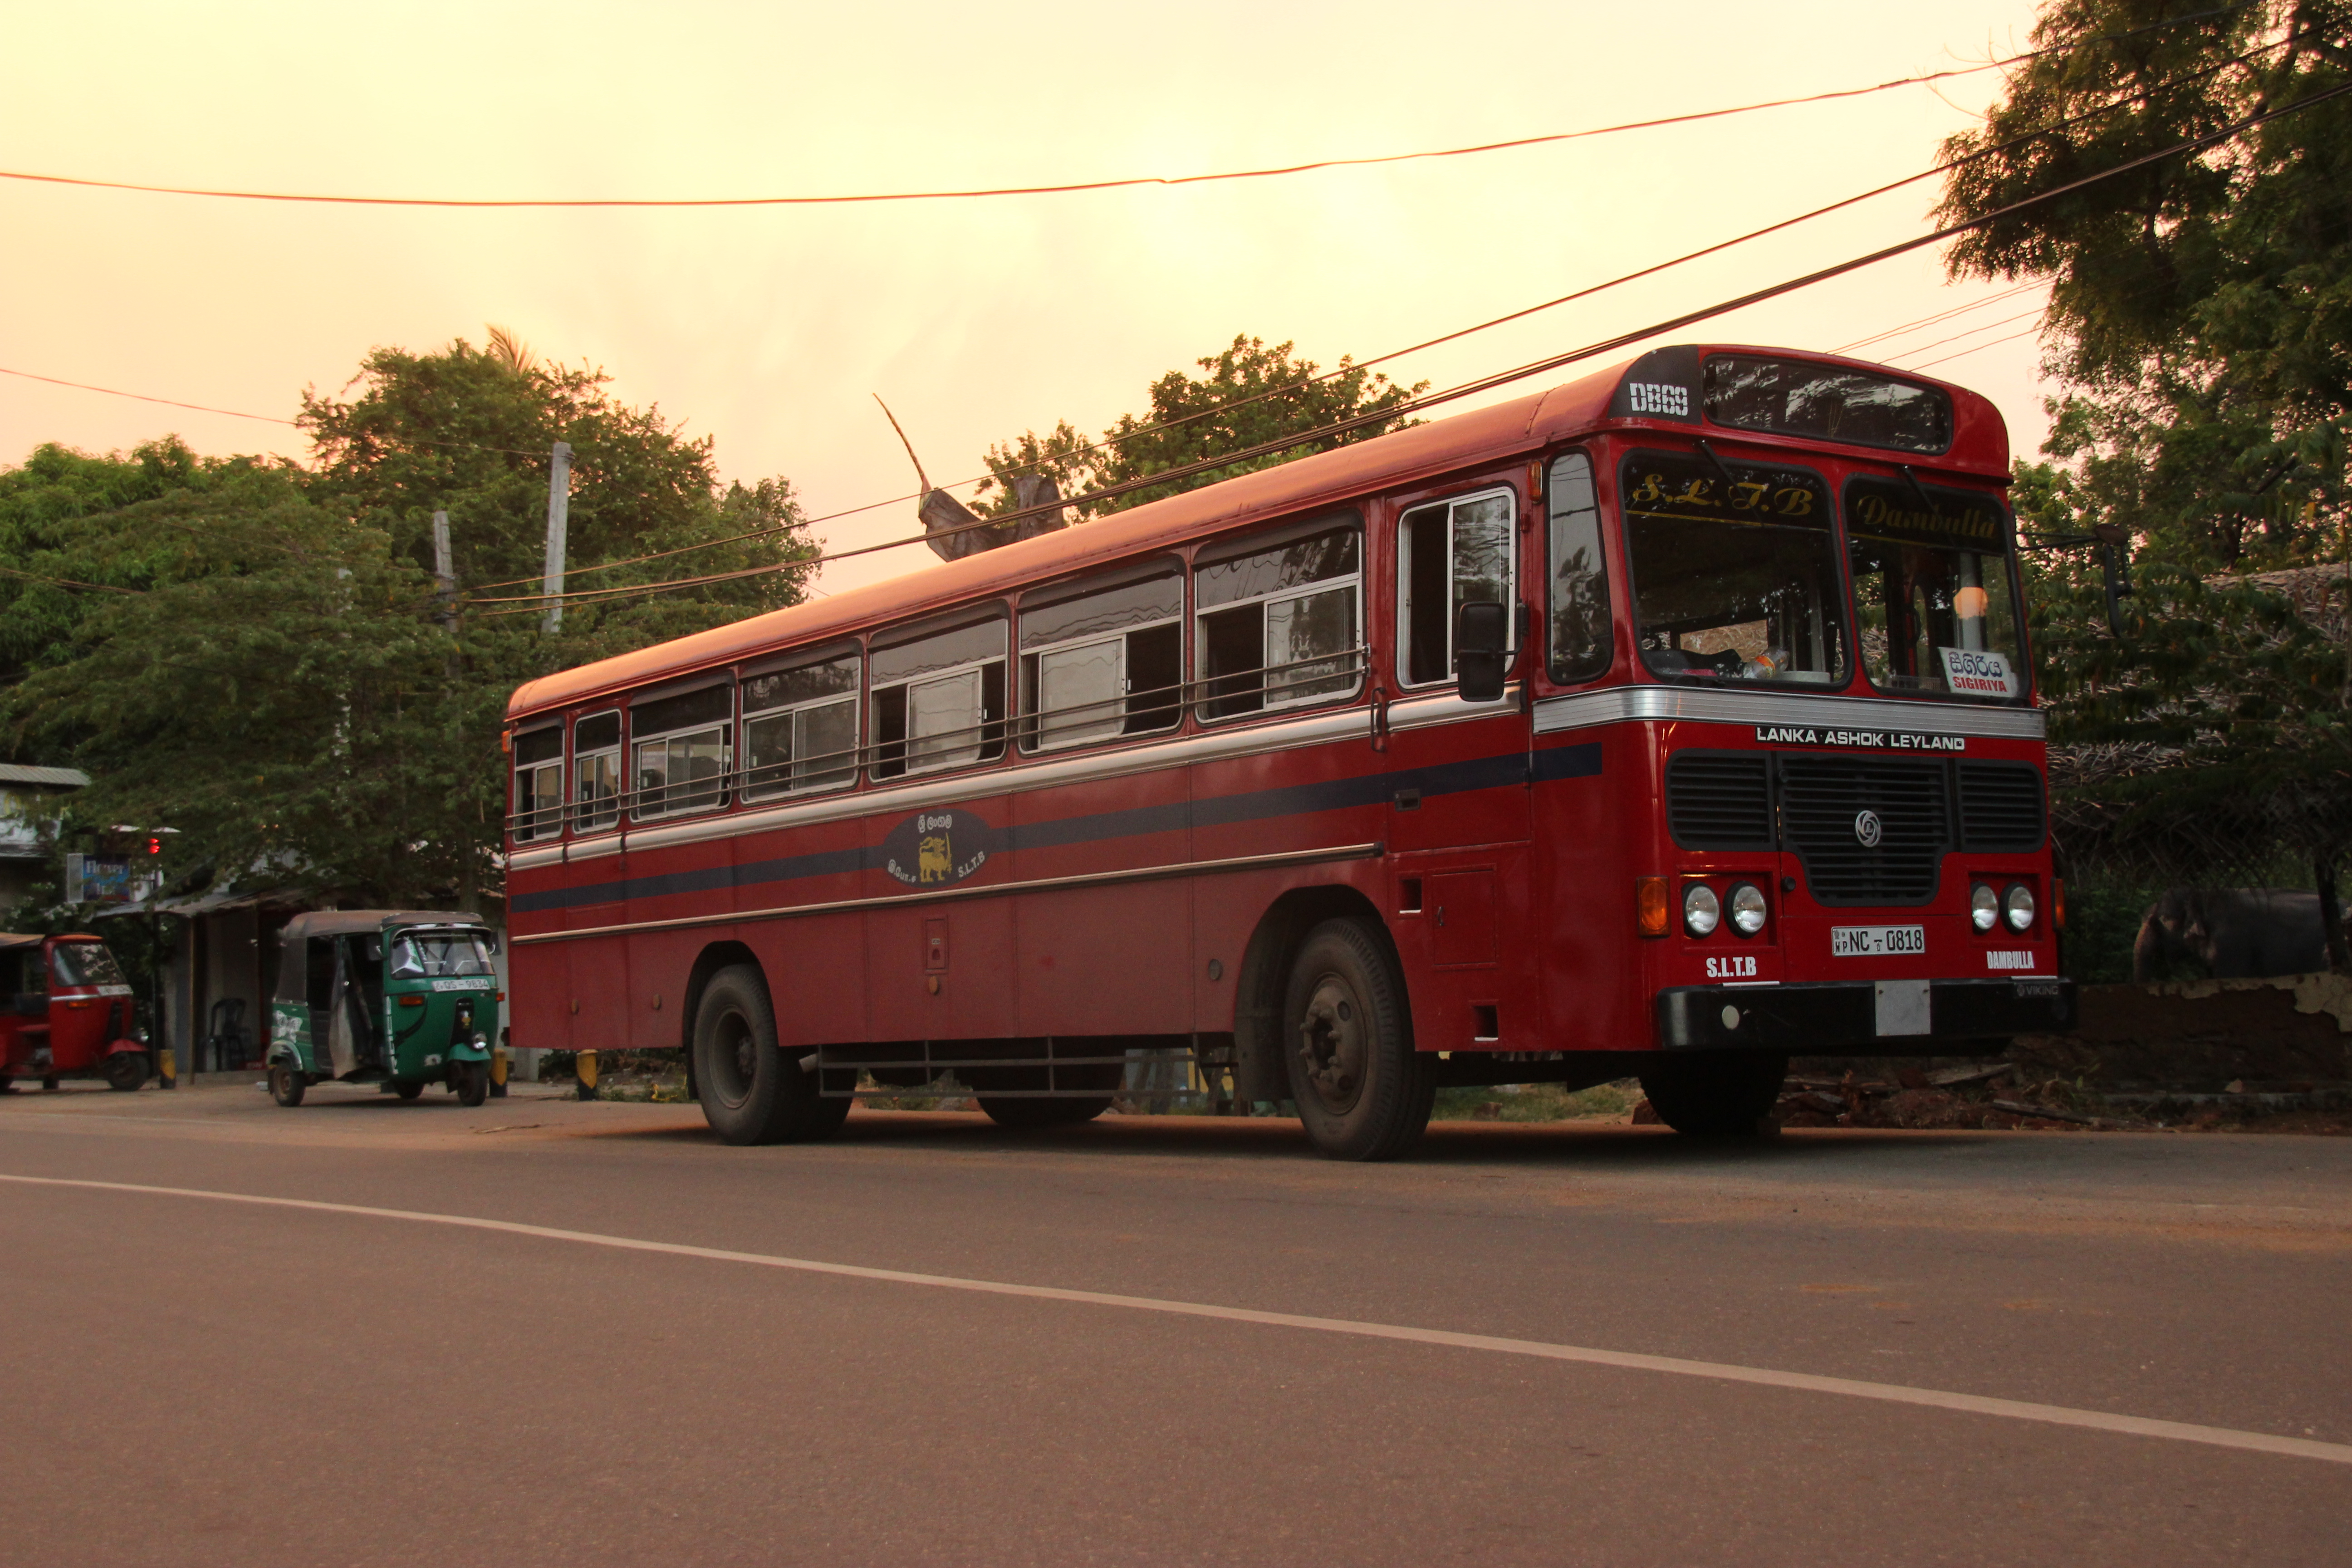 Autobús que cubre la línia Dambulla-Sigirya aparcado en plena carretera Sigirya, Sri Lanka